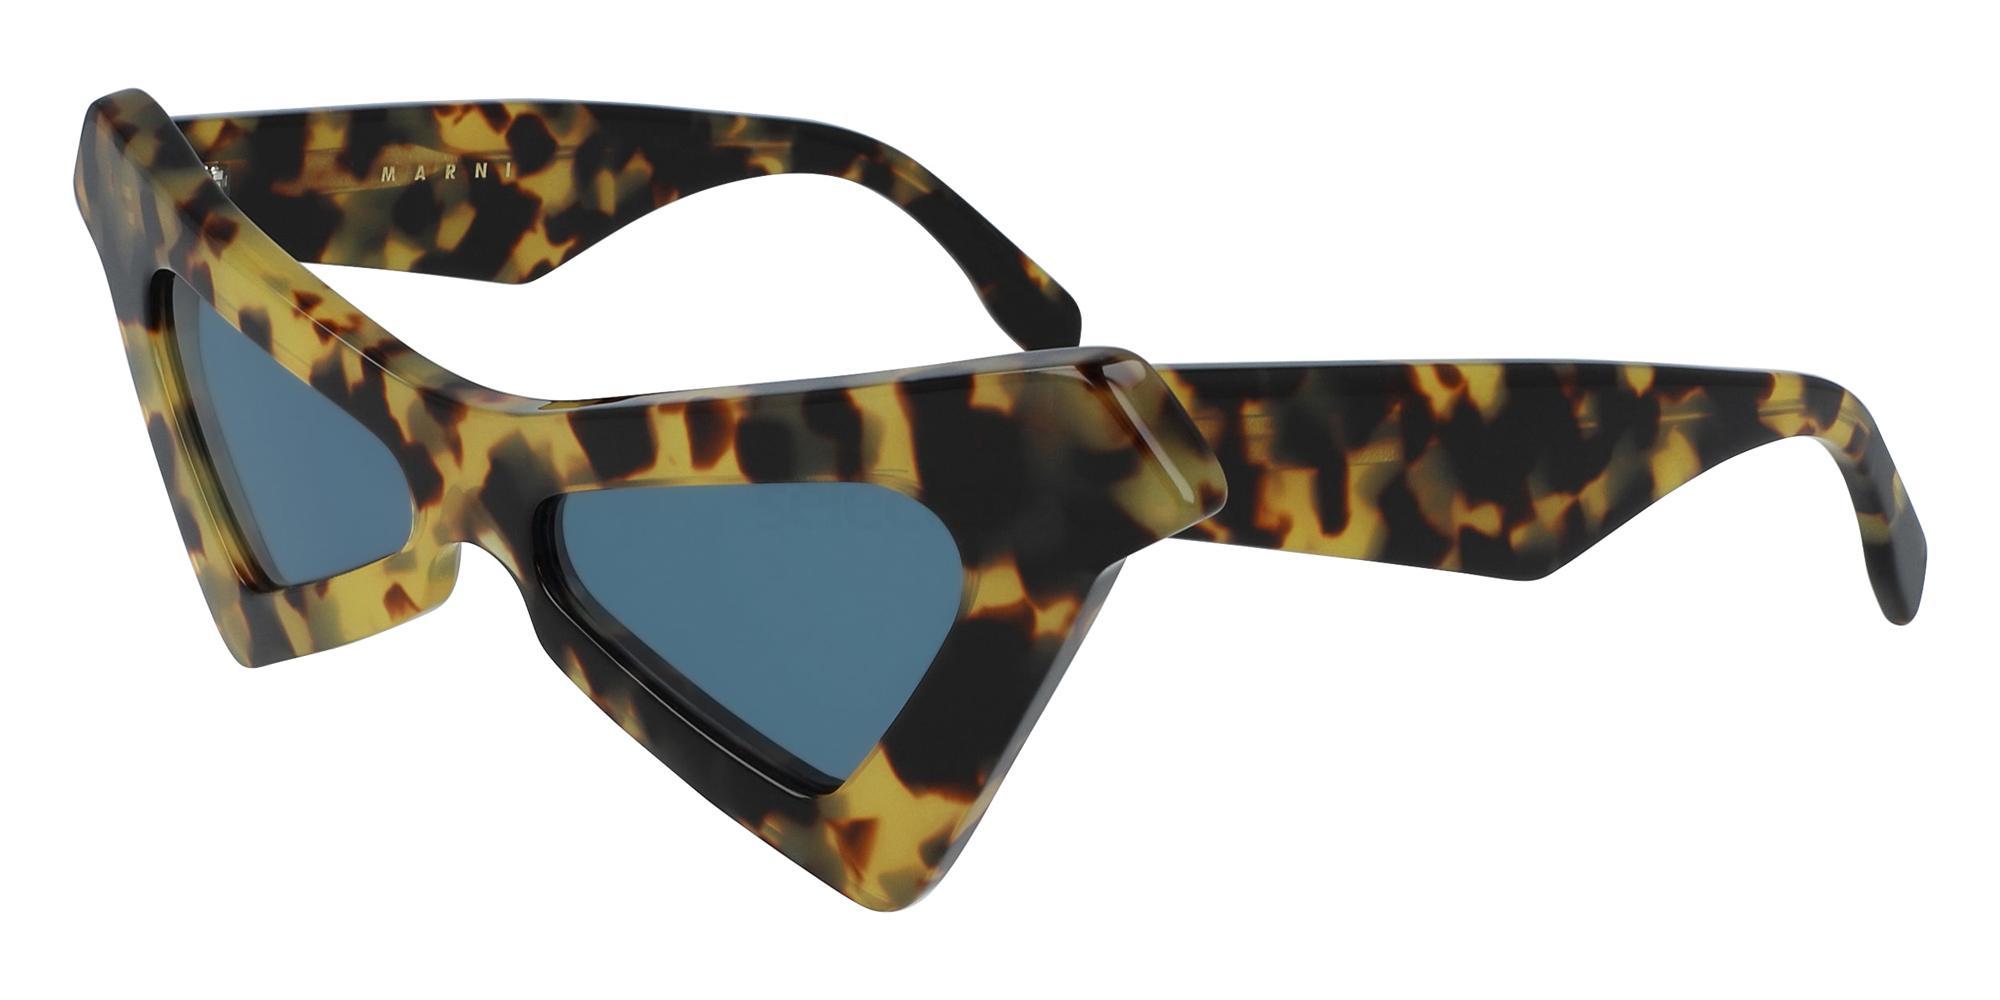 218 ME637S Sunglasses, Marni